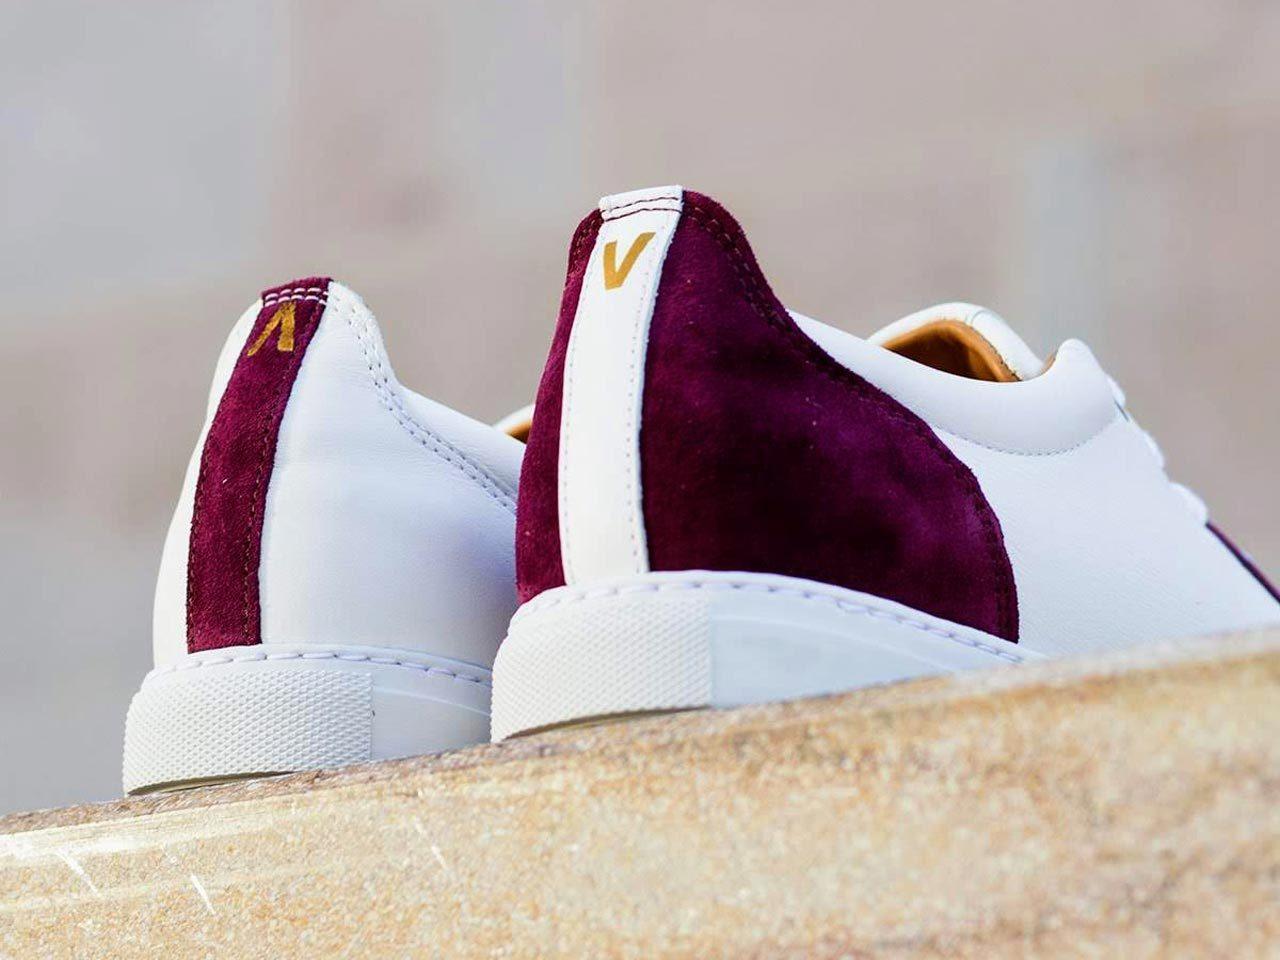 Caval-Vincent-Mia-Divine-purple-sneakers